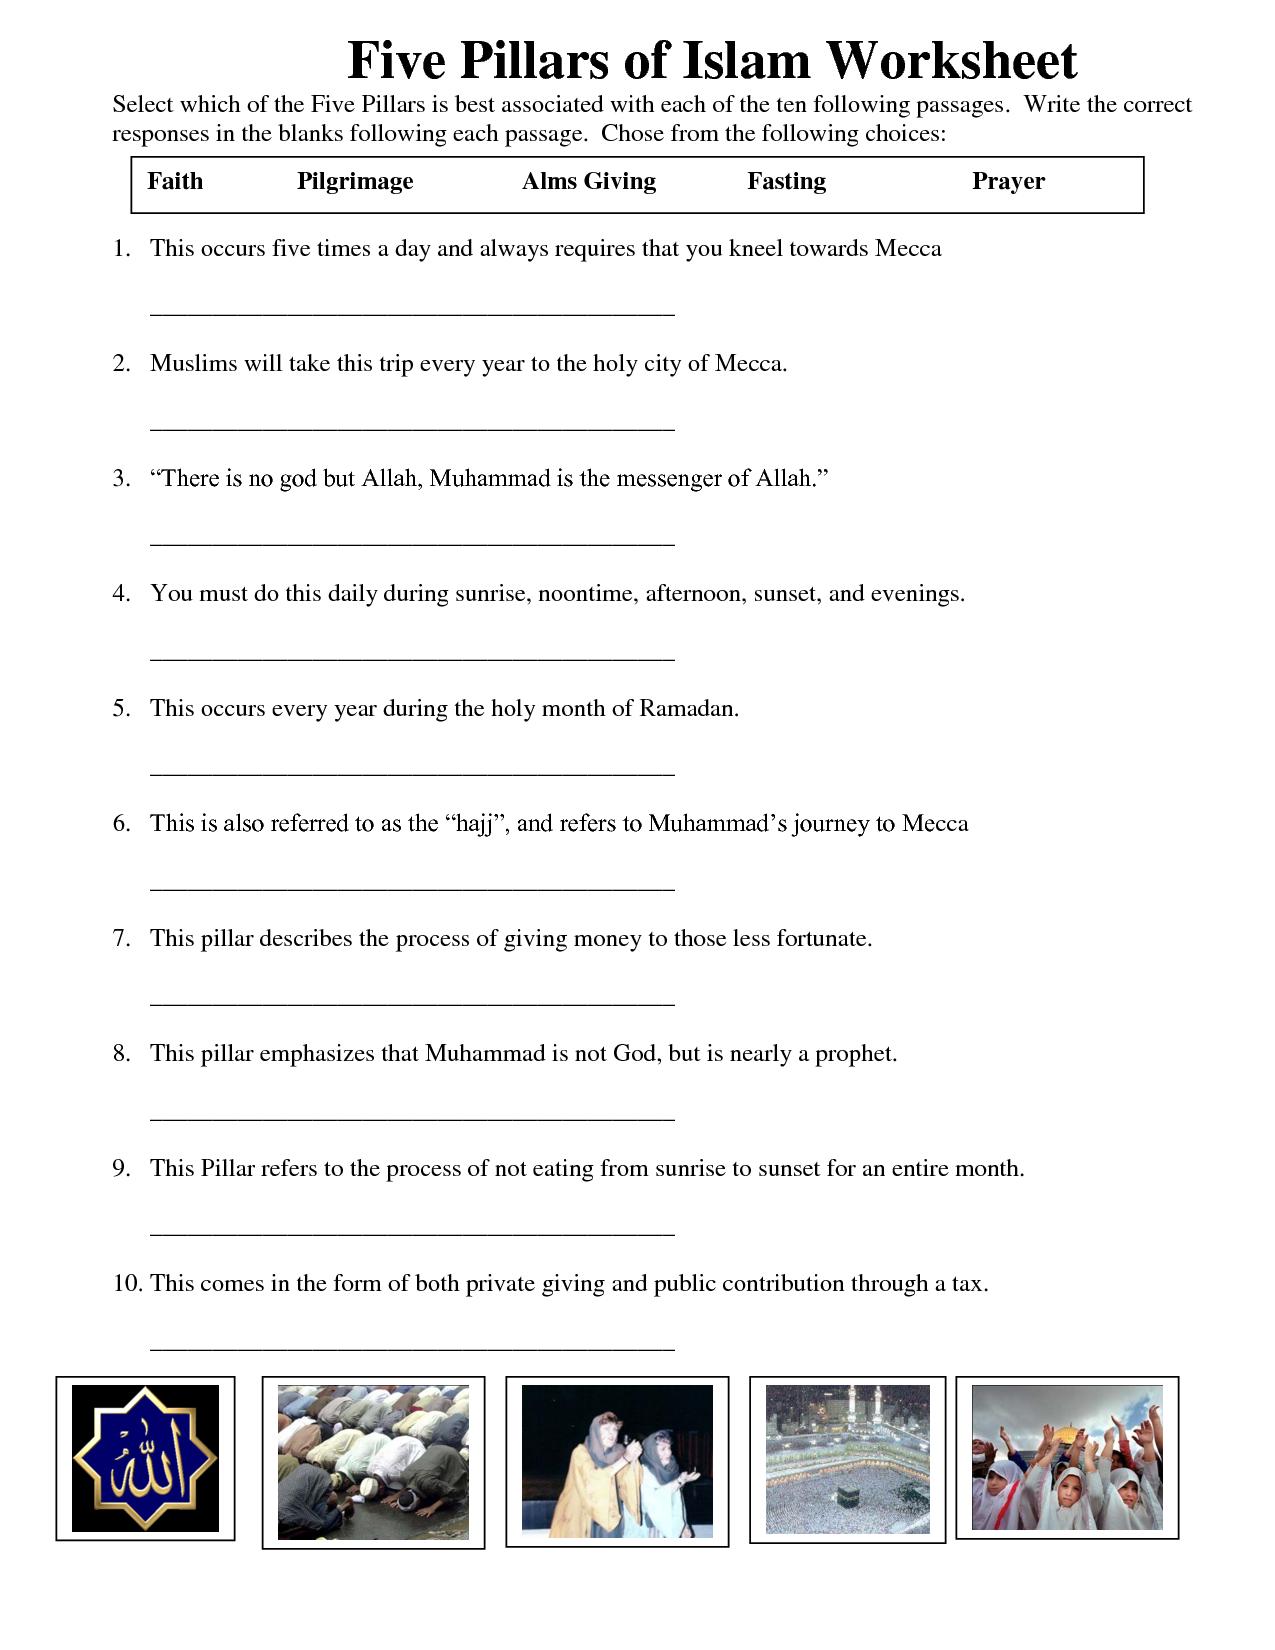 worksheet Five Pillars Of Islam Worksheet Answers a muslim homeschool islamic studies lesson 3 why did allah create you 99 names pinterest and